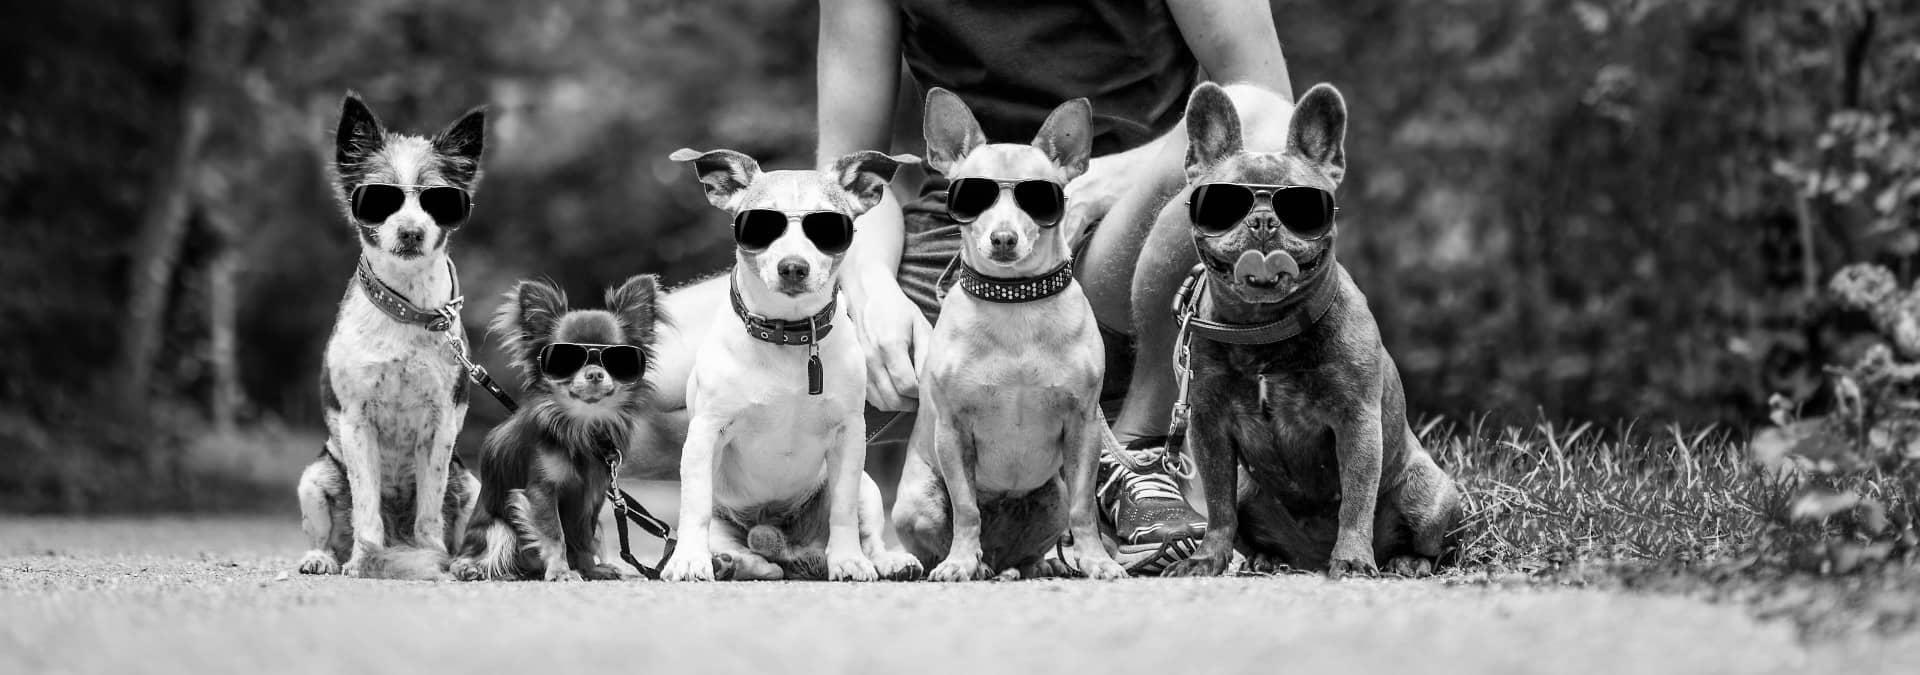 Dharma Dog training services